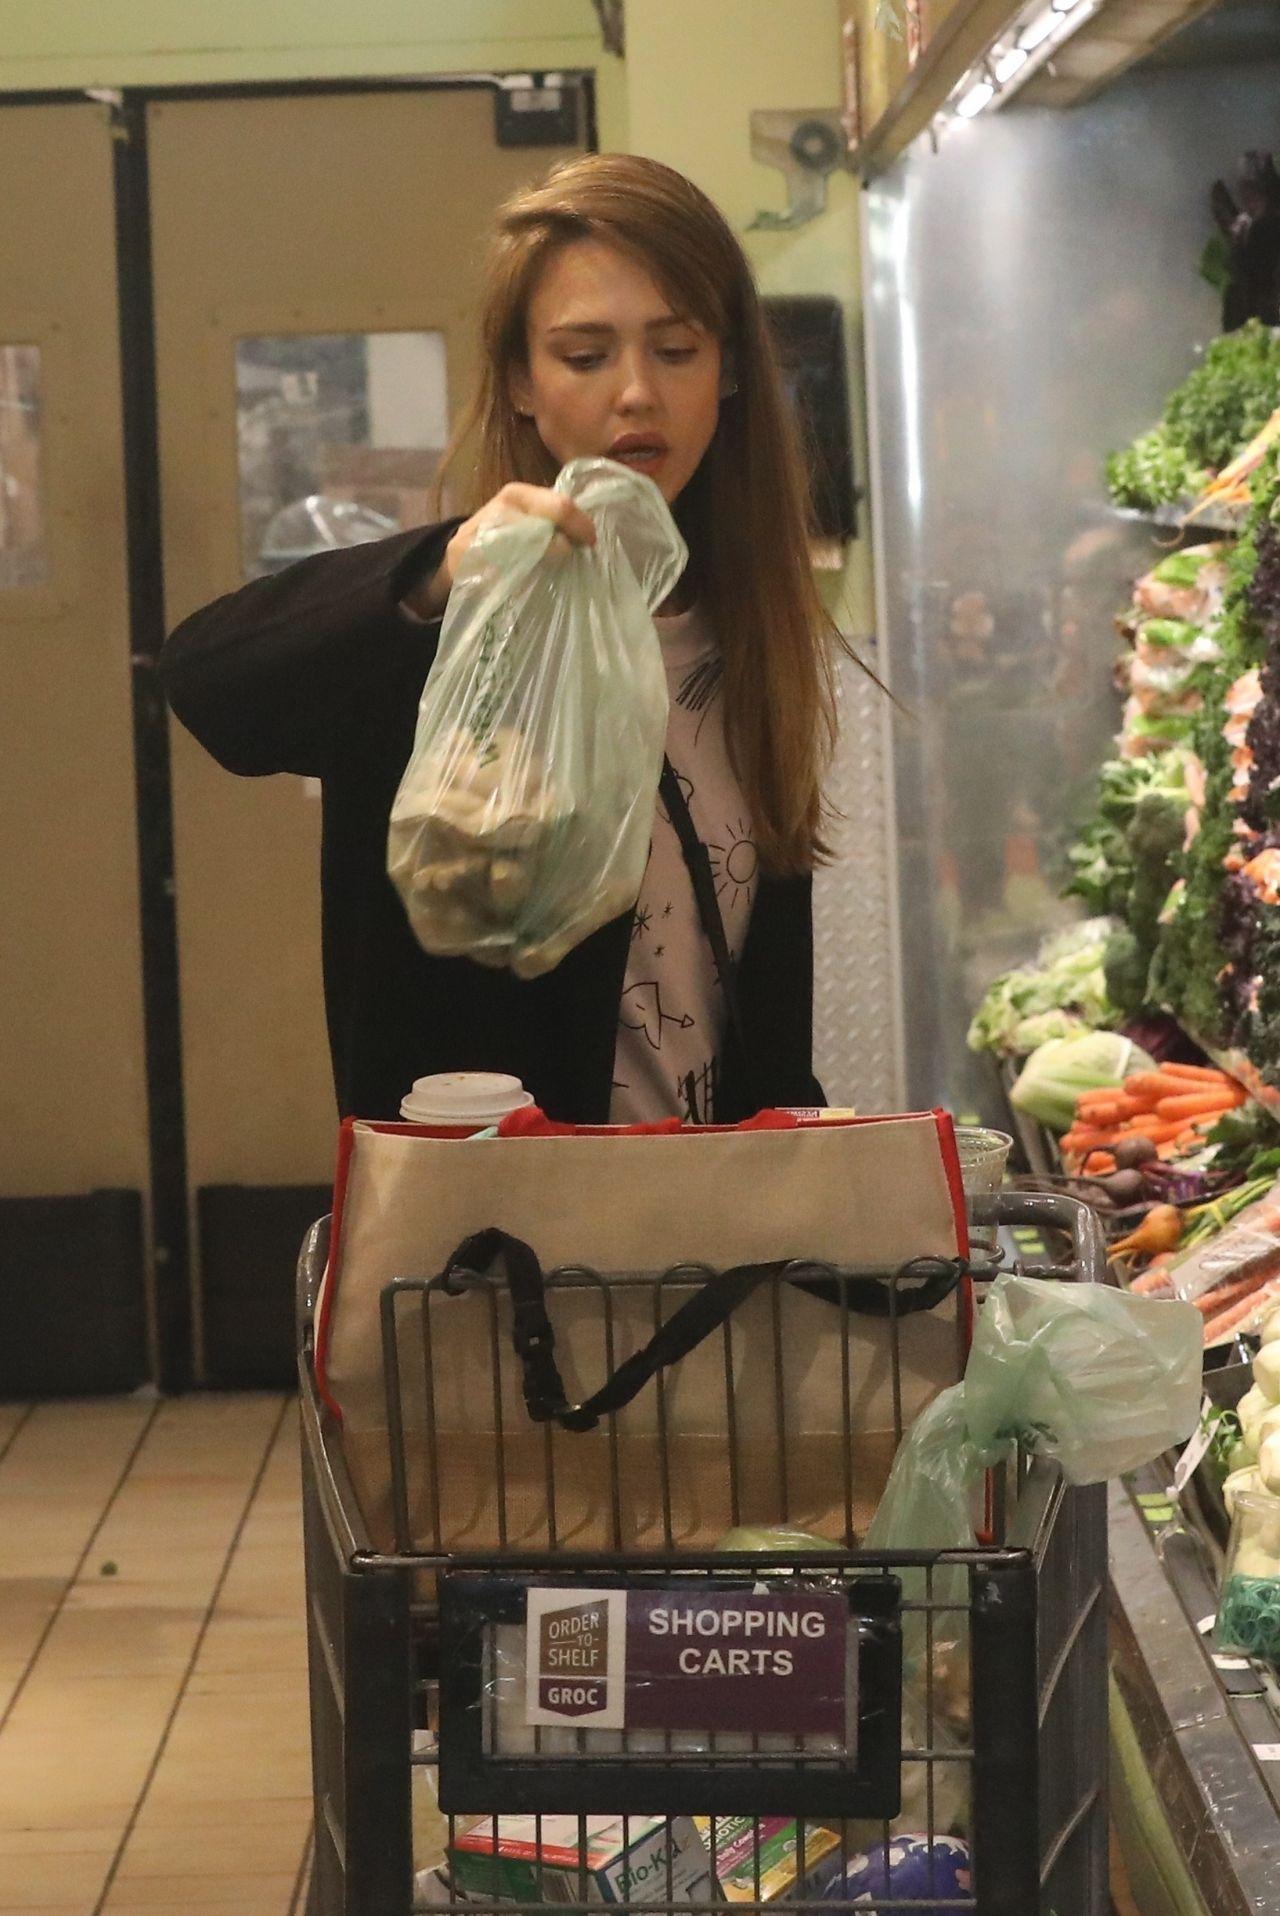 https://celebmafia.com/wp-content/uploads/2019/03/jessica-alba-shopping-at-whole-foods-market-in-beverly-hills-03-09-2019-6.jpg